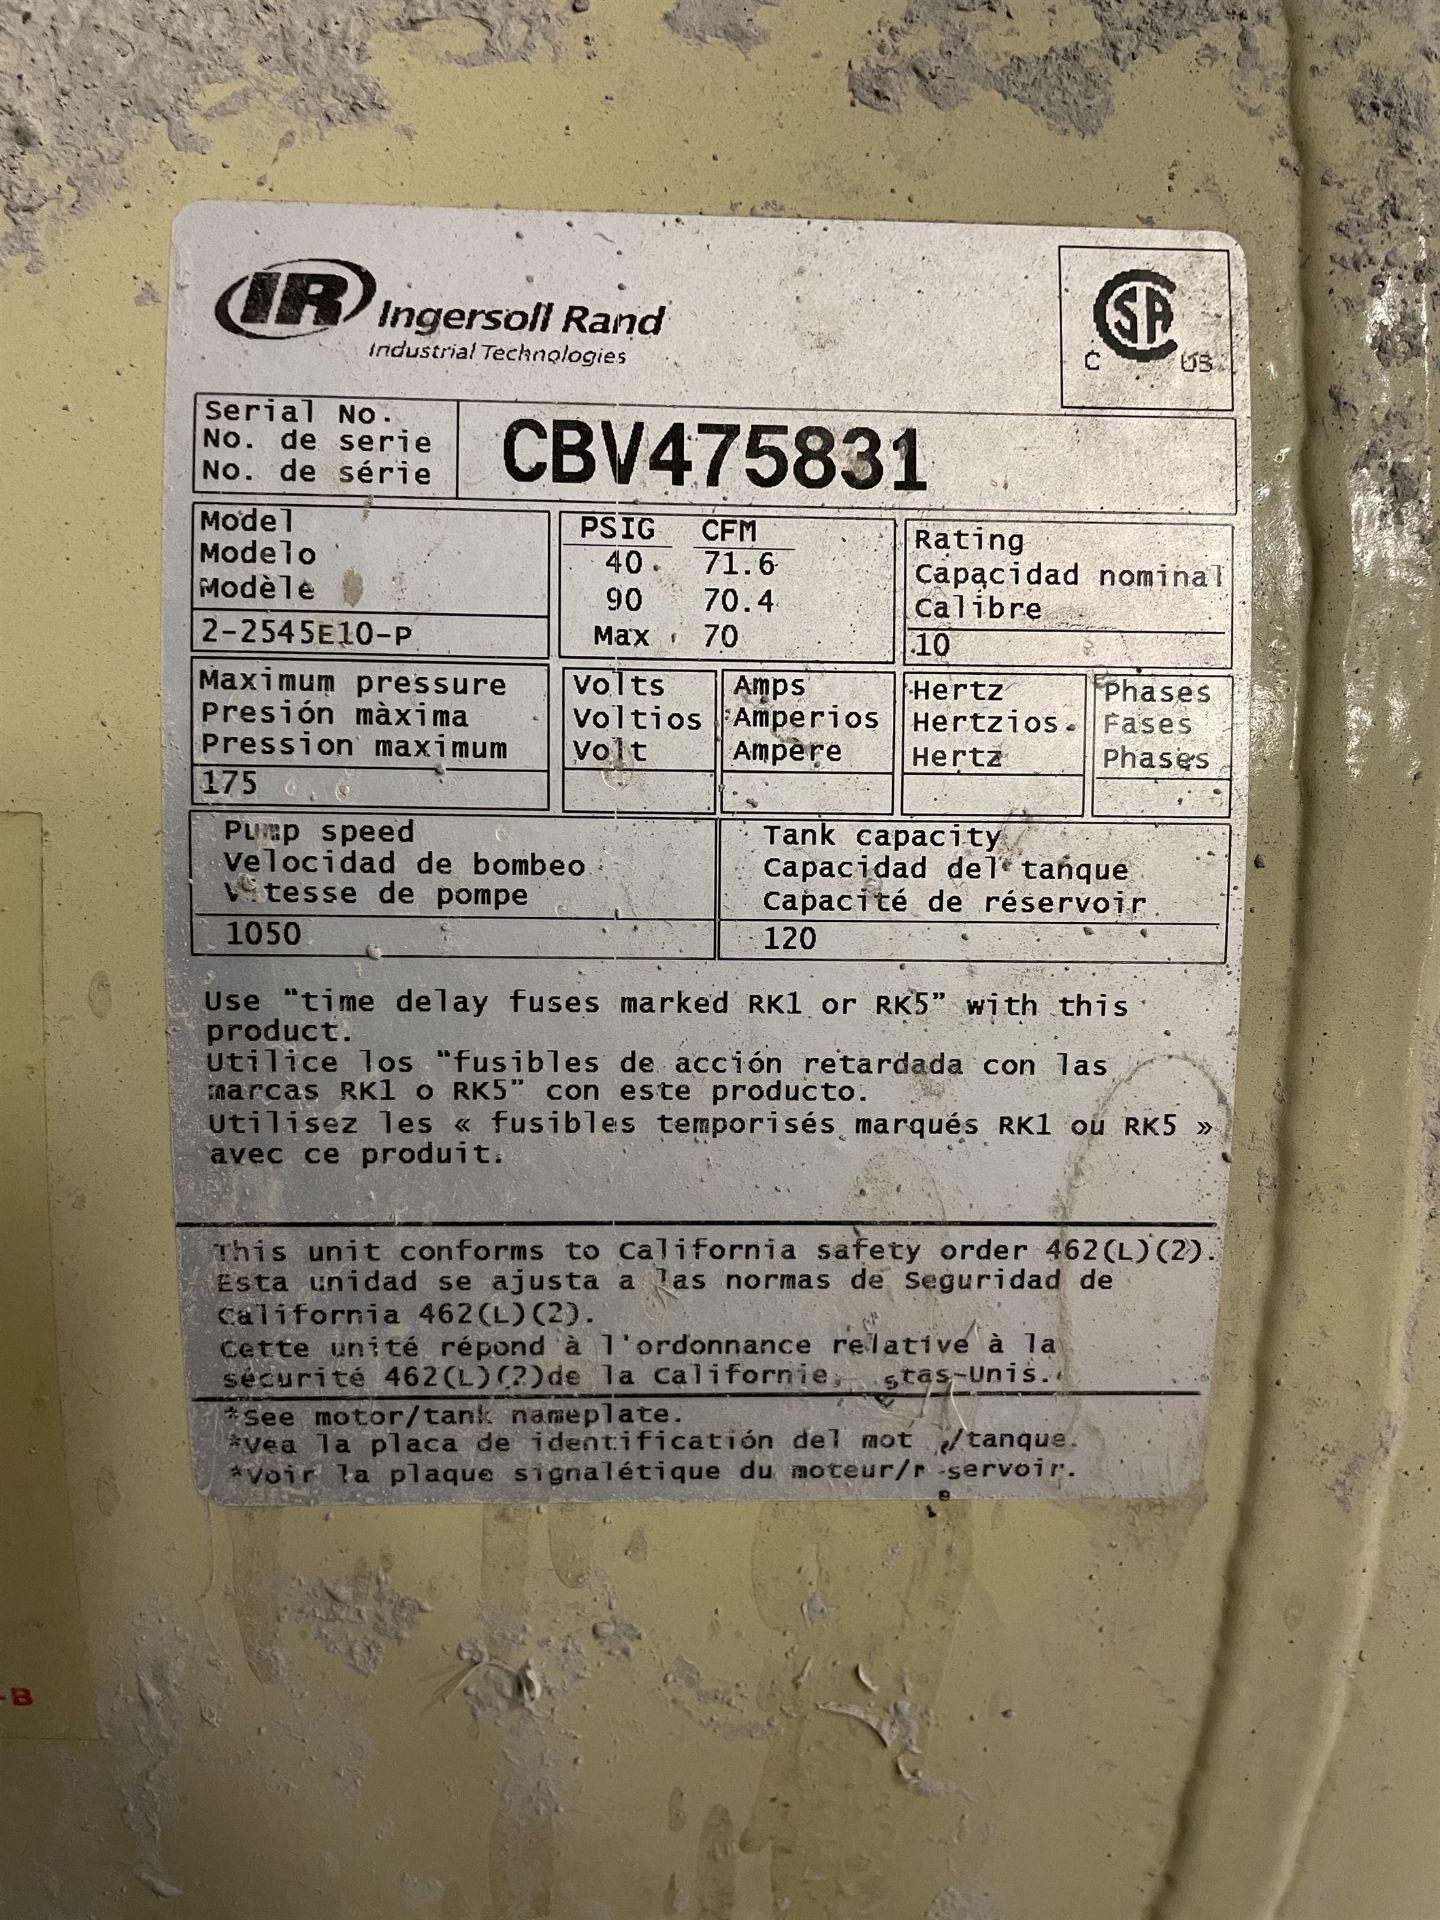 INGERSOLL RAND 2-2545E10-P 20-HP Air Compressor, s/n CBV475831 - Image 5 of 5